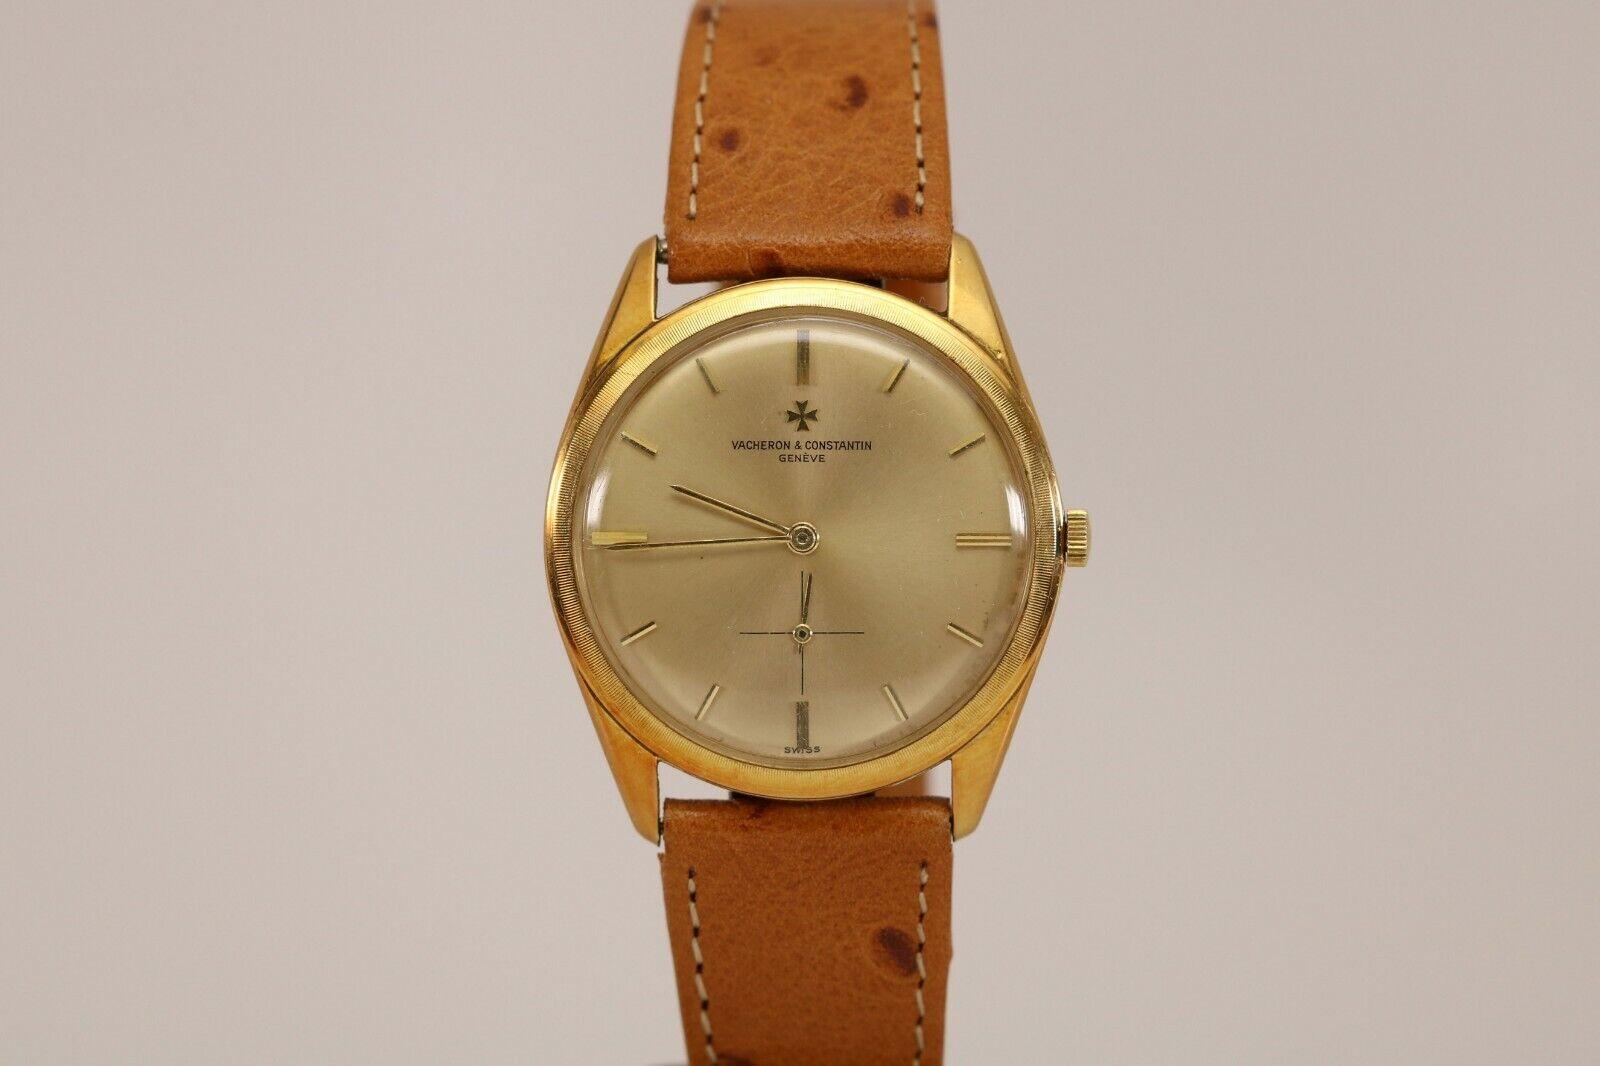 Vacheron Constantin 18K Yellow Gold Mechanical Vintage Watch Ref 6360 34mm 1960s - watch picture 1